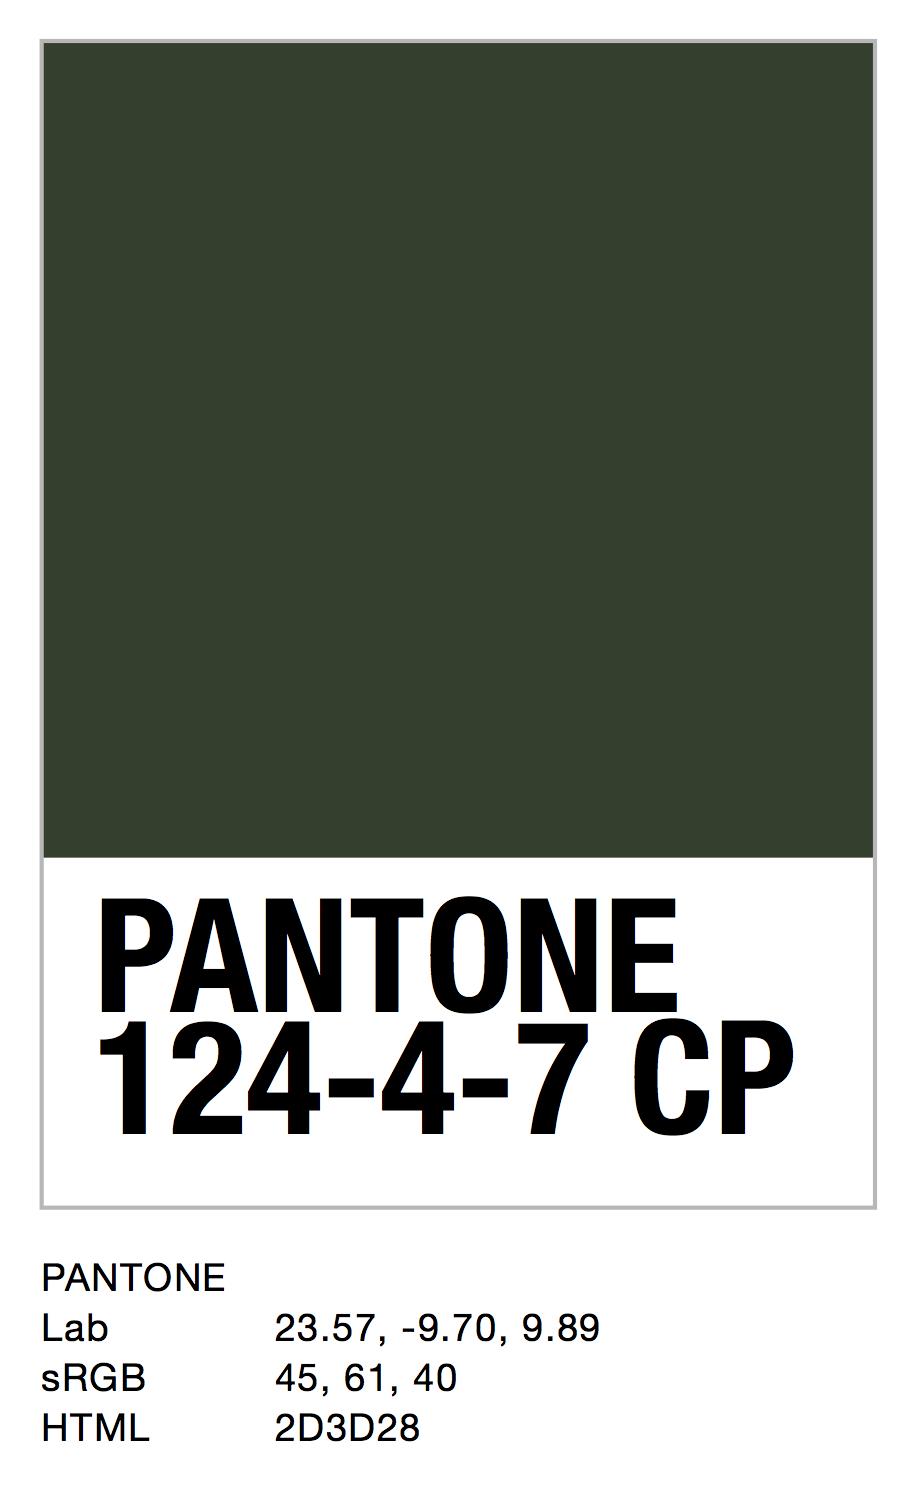 PANTONE 124-4-7 CP.jpg